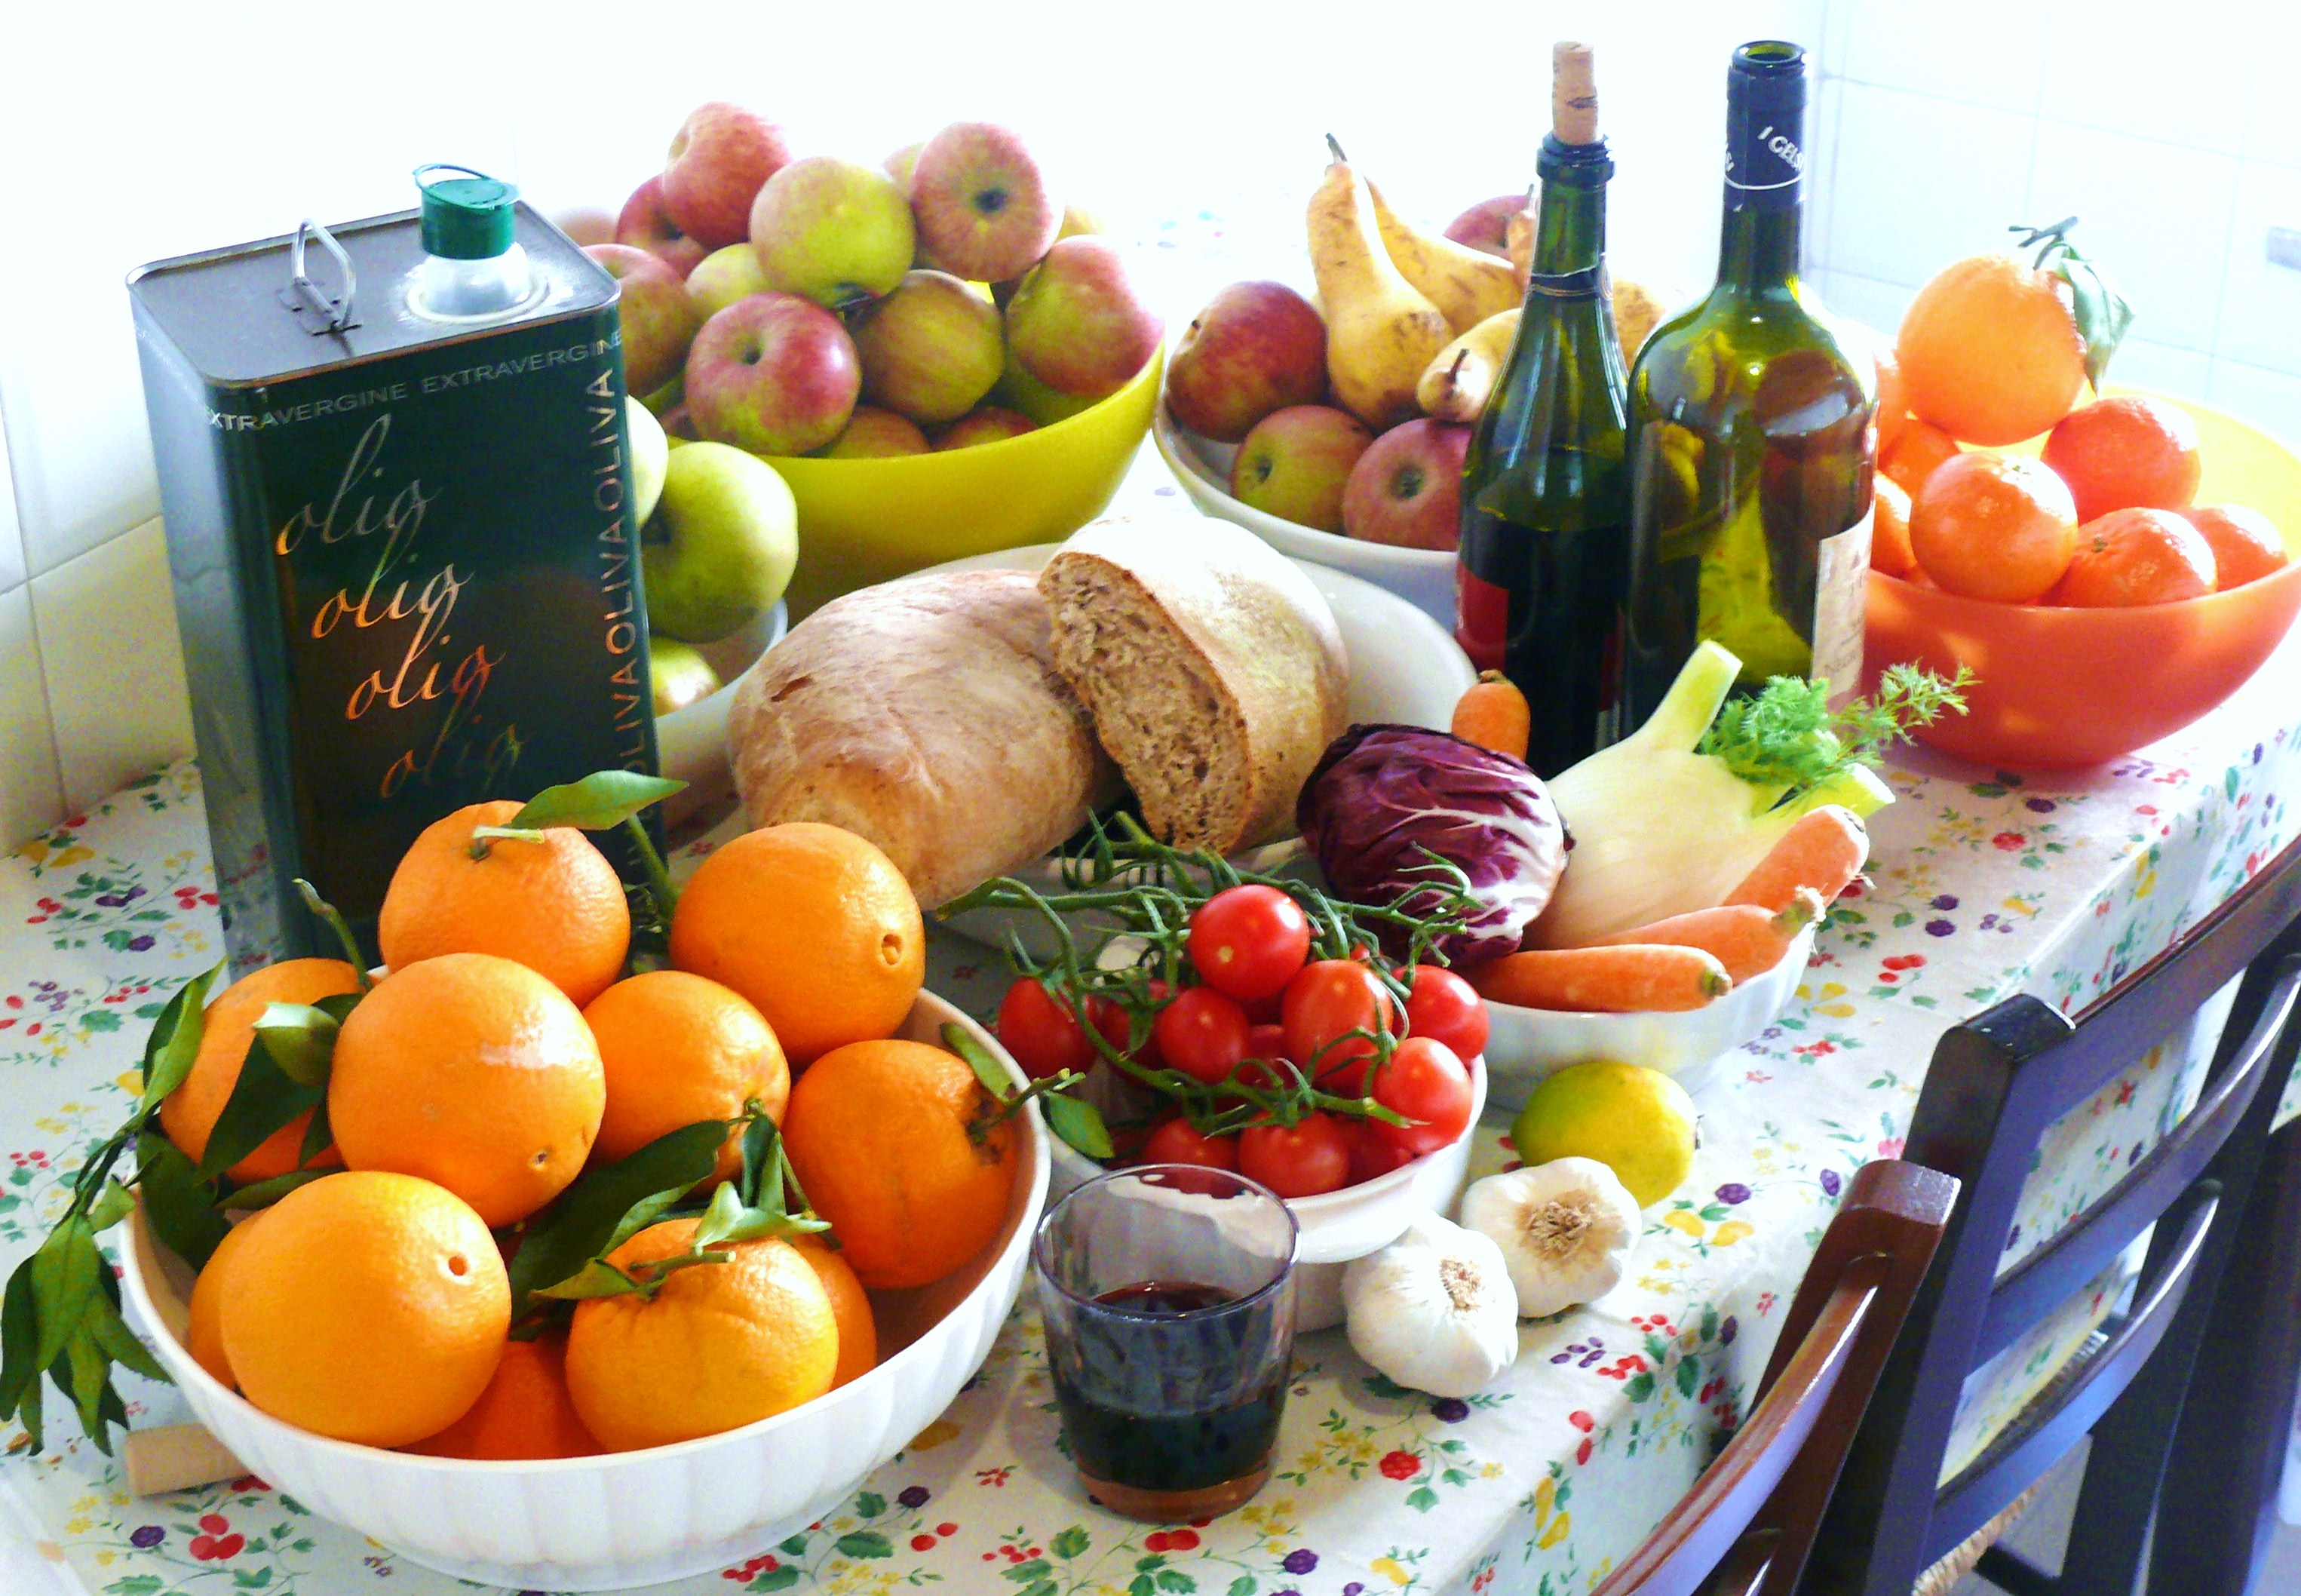 dieta mediterranea e alimenti funzionali